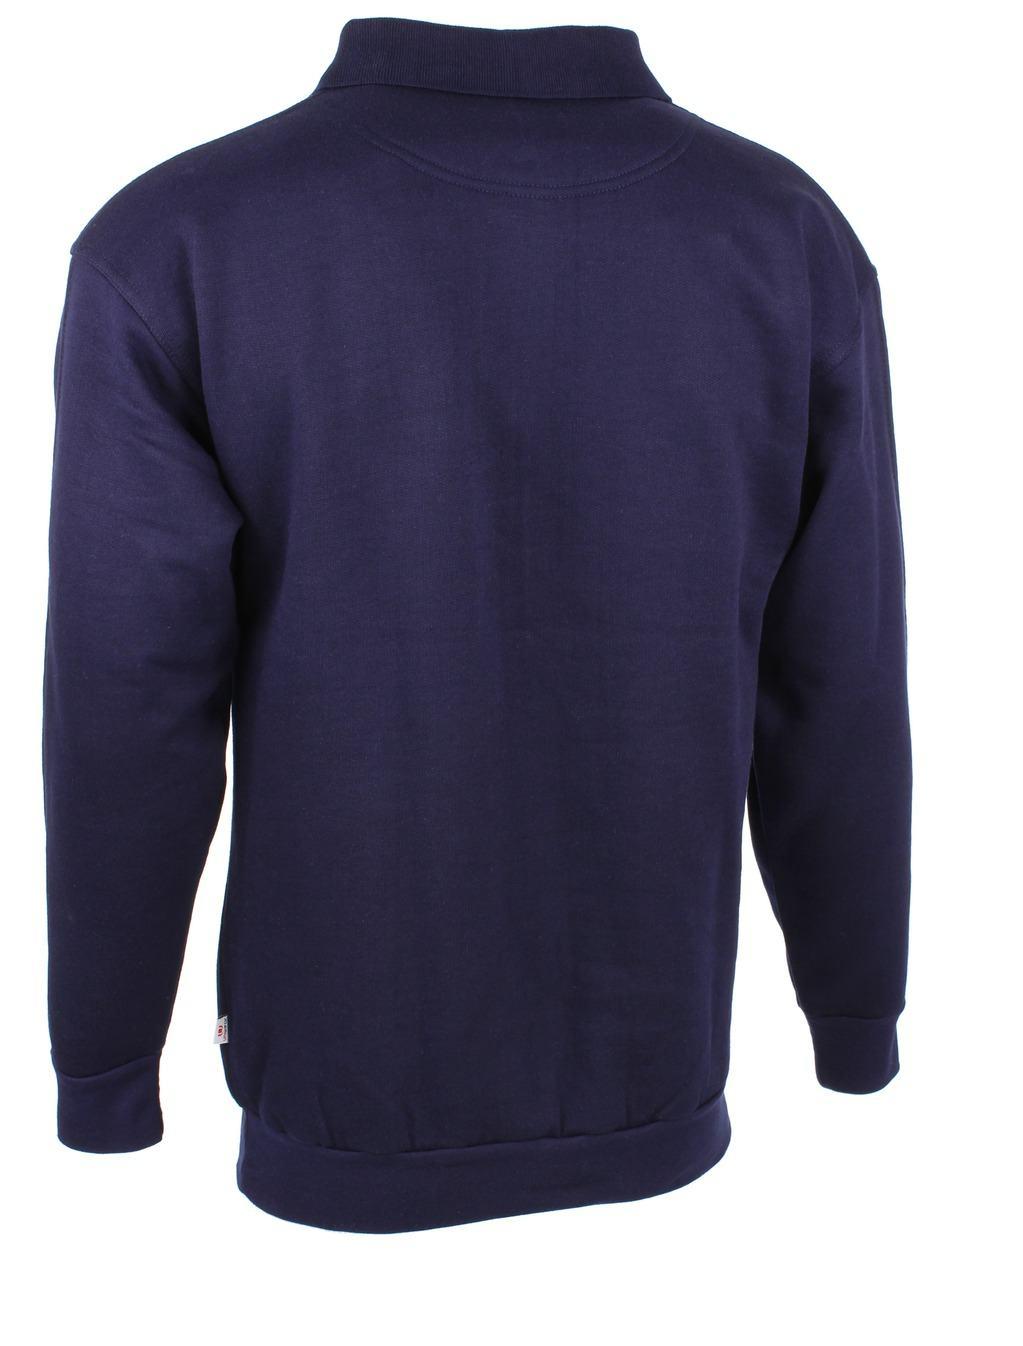 UNIWEAR Polosweater